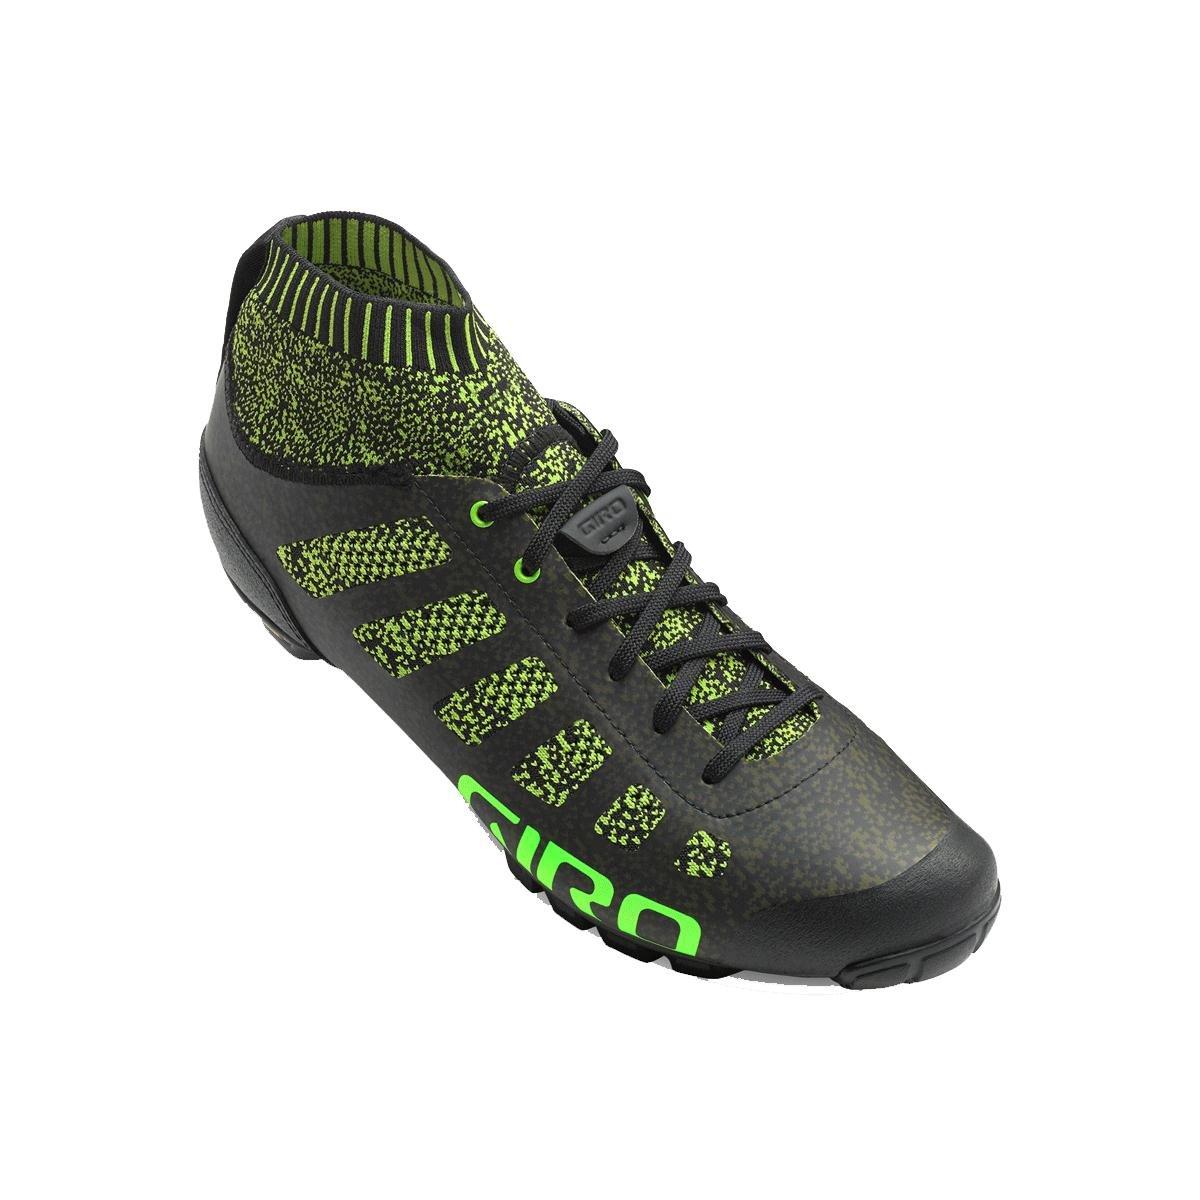 Giro Empire VR70 Knit Cycling Shoes - Men's B075RTTMFJ 42.5|Lime/Black